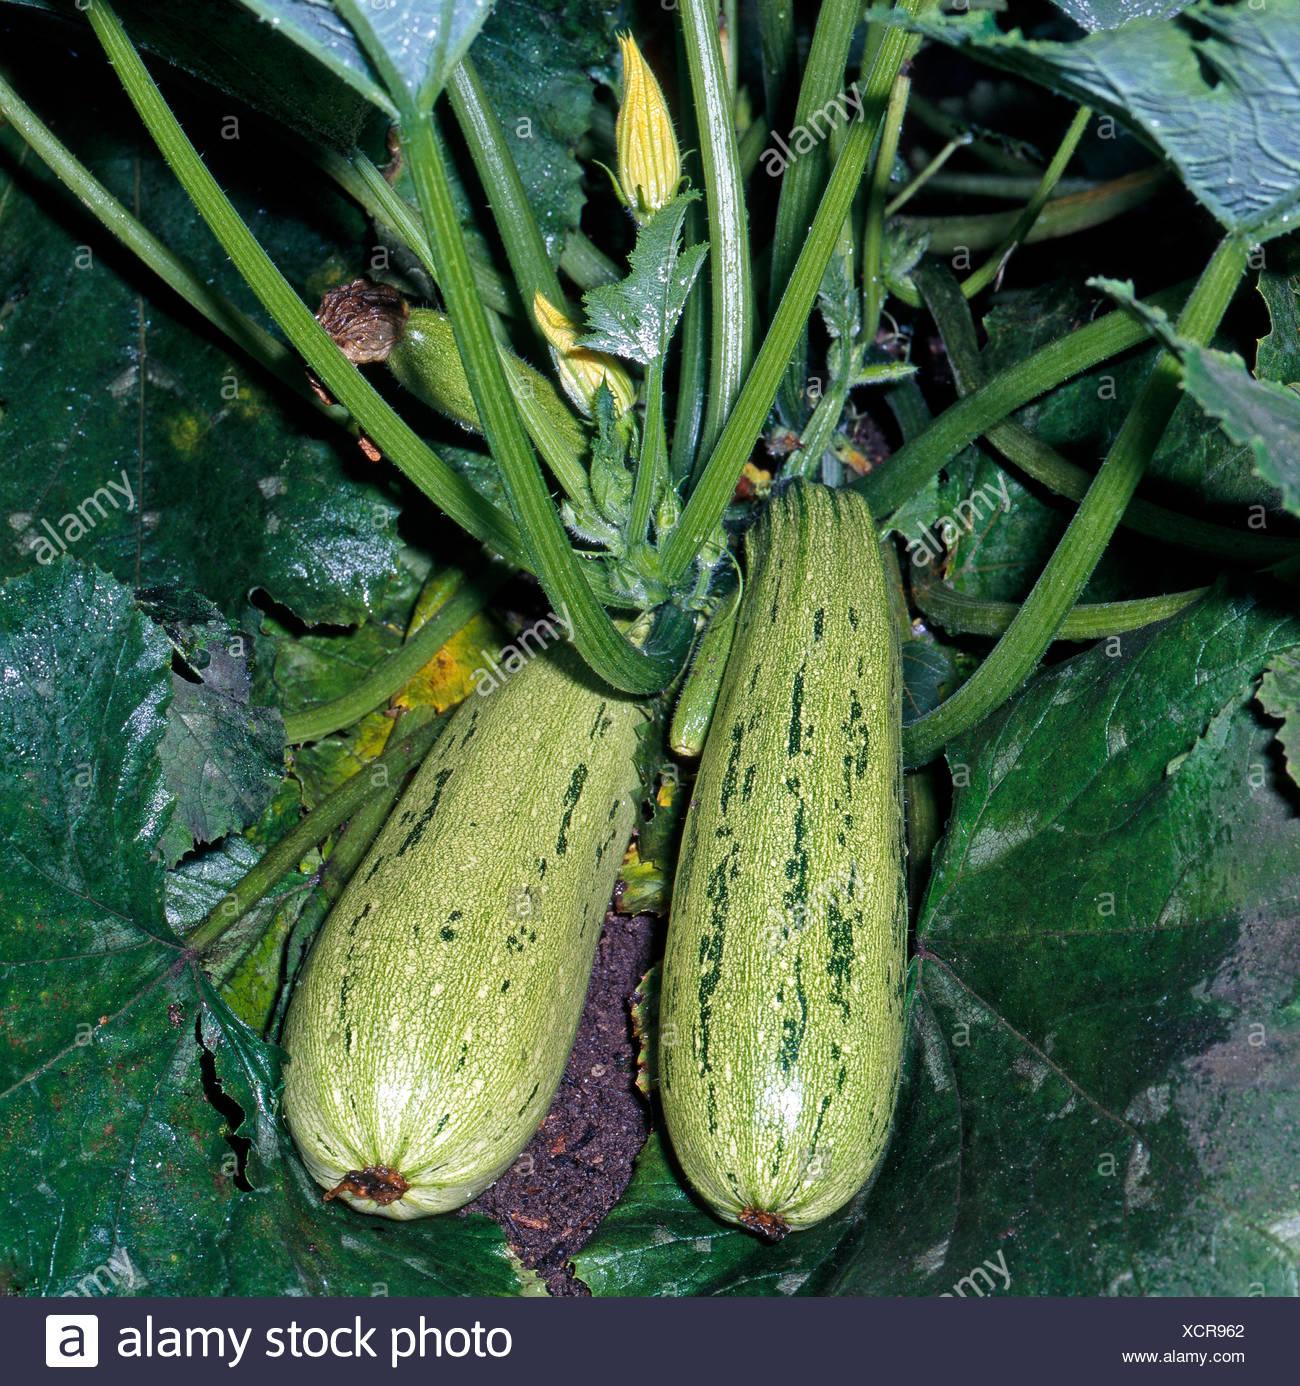 cream green courgette fruits, a subspecies of the squash Cucurbita pepo, - Stock Image